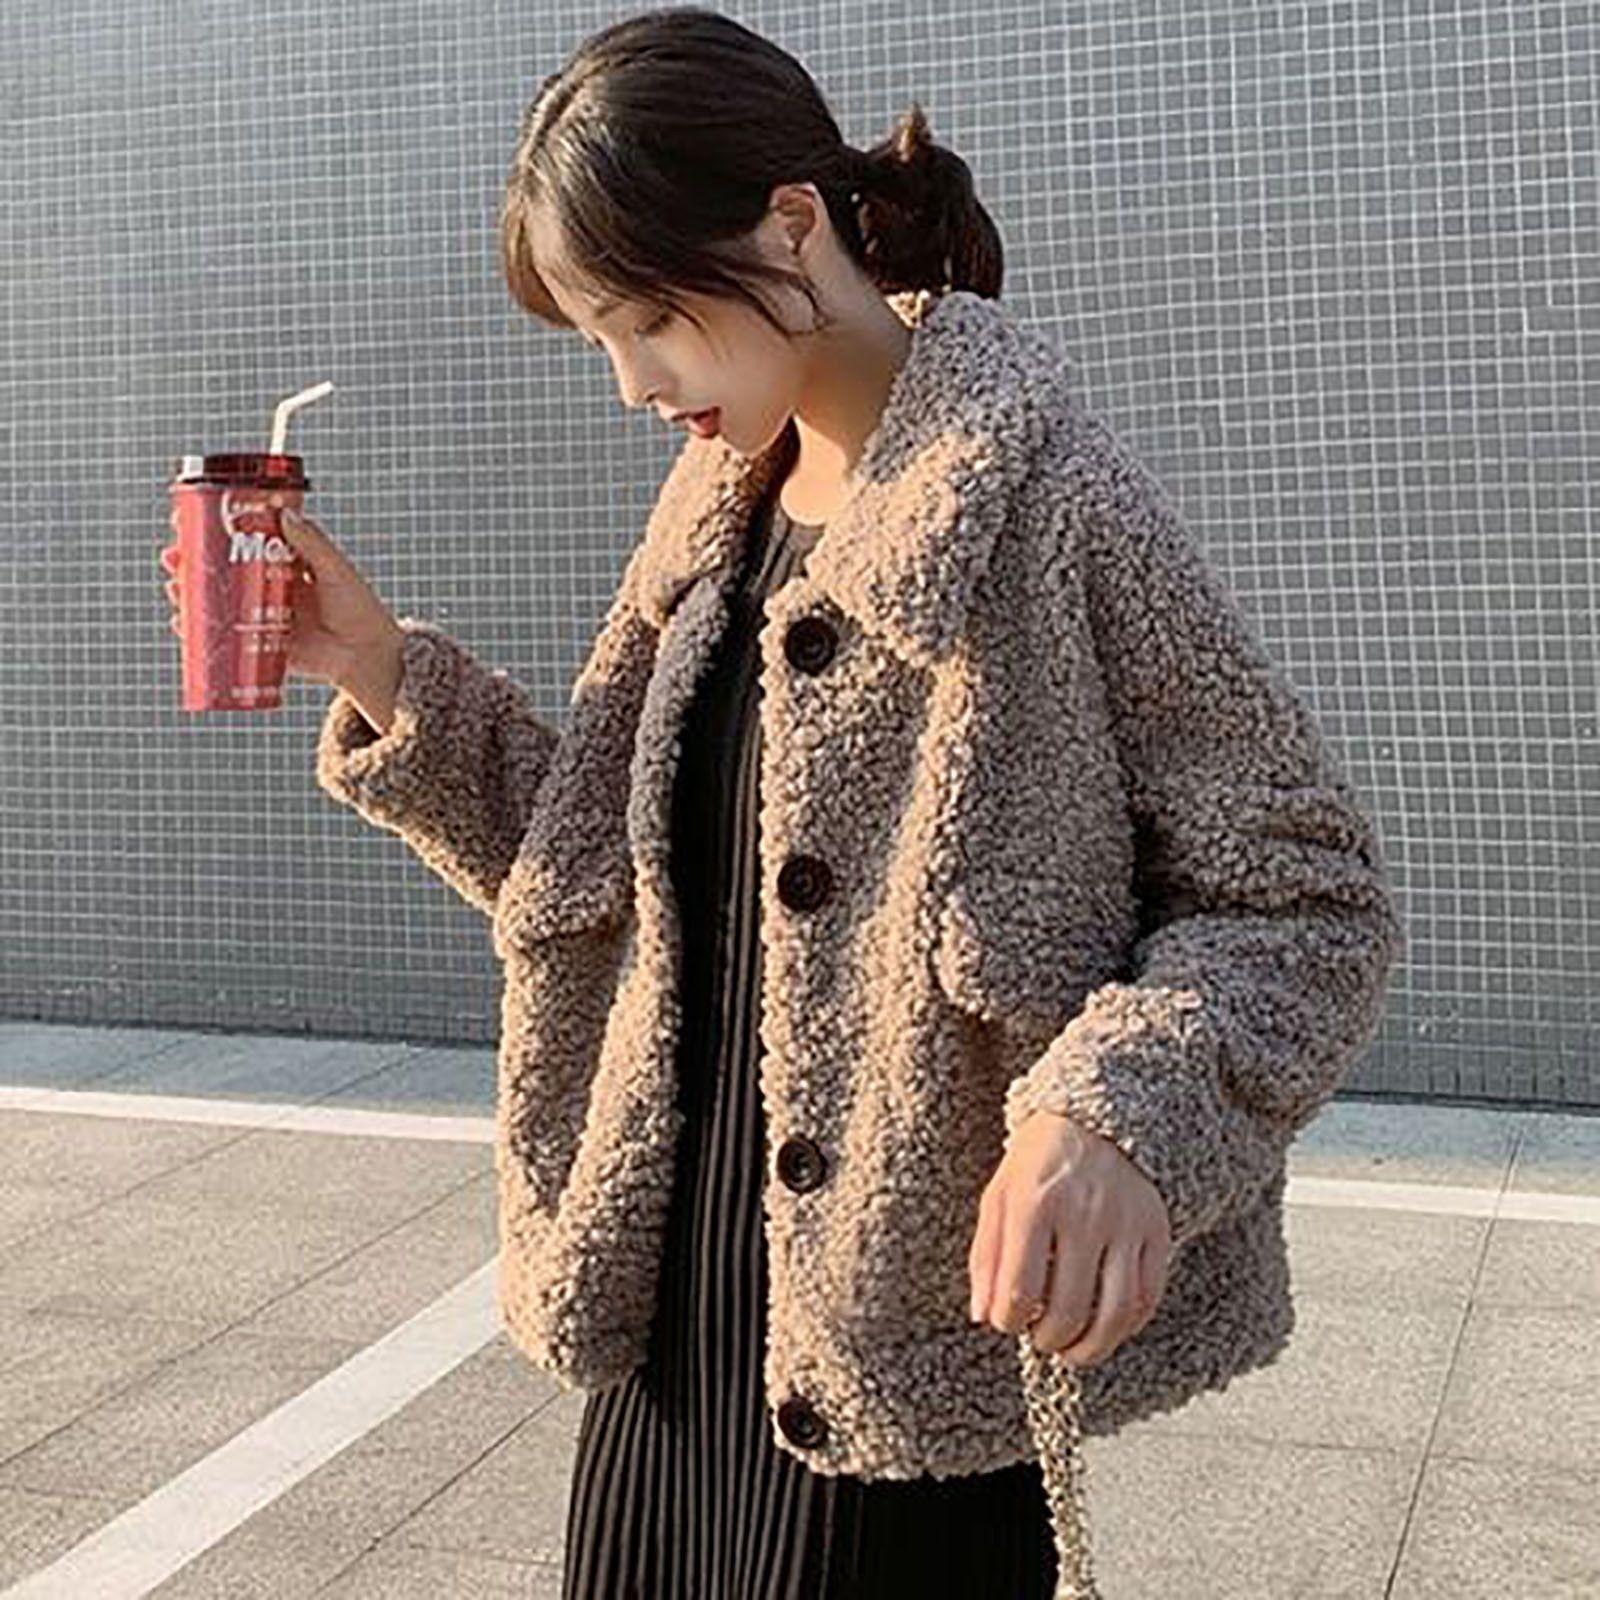 Damen Winter Mode Langarm Solide Farben Revers Lose Warm Plüsch Teddy Faux Pelzmäntel Mantel Plus Größe Chaqueta Mujer # G3